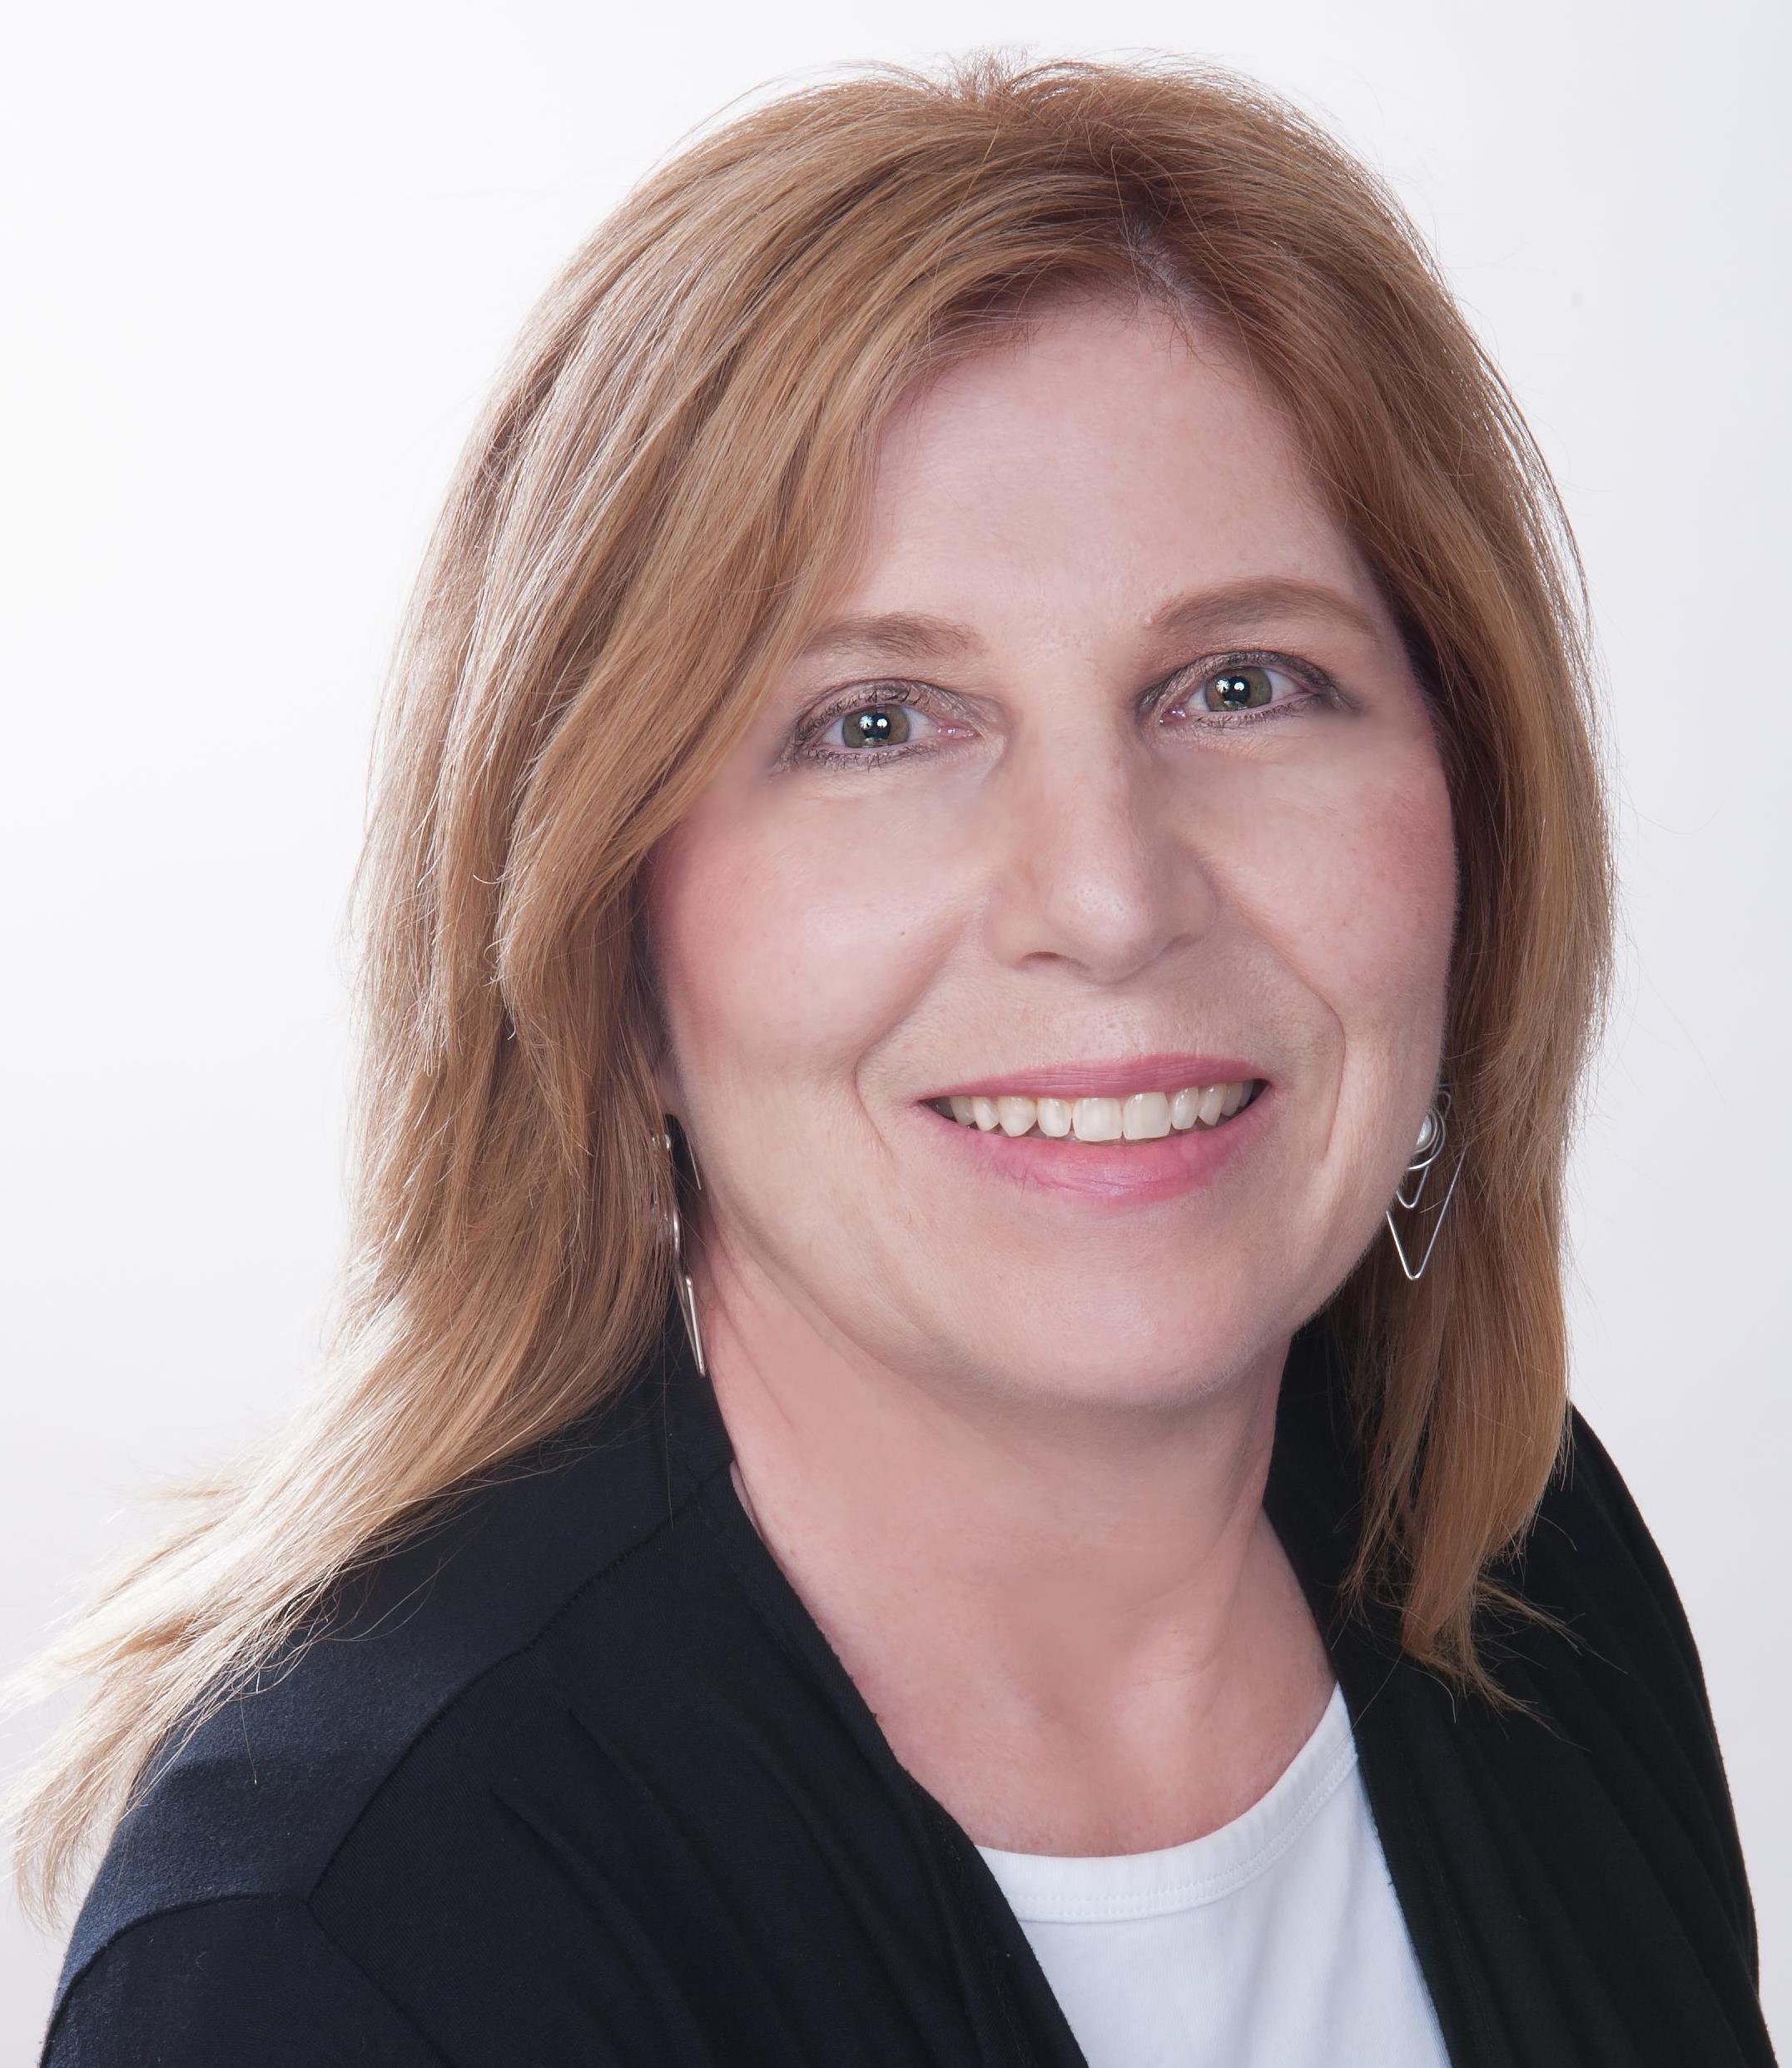 Lisa Davey